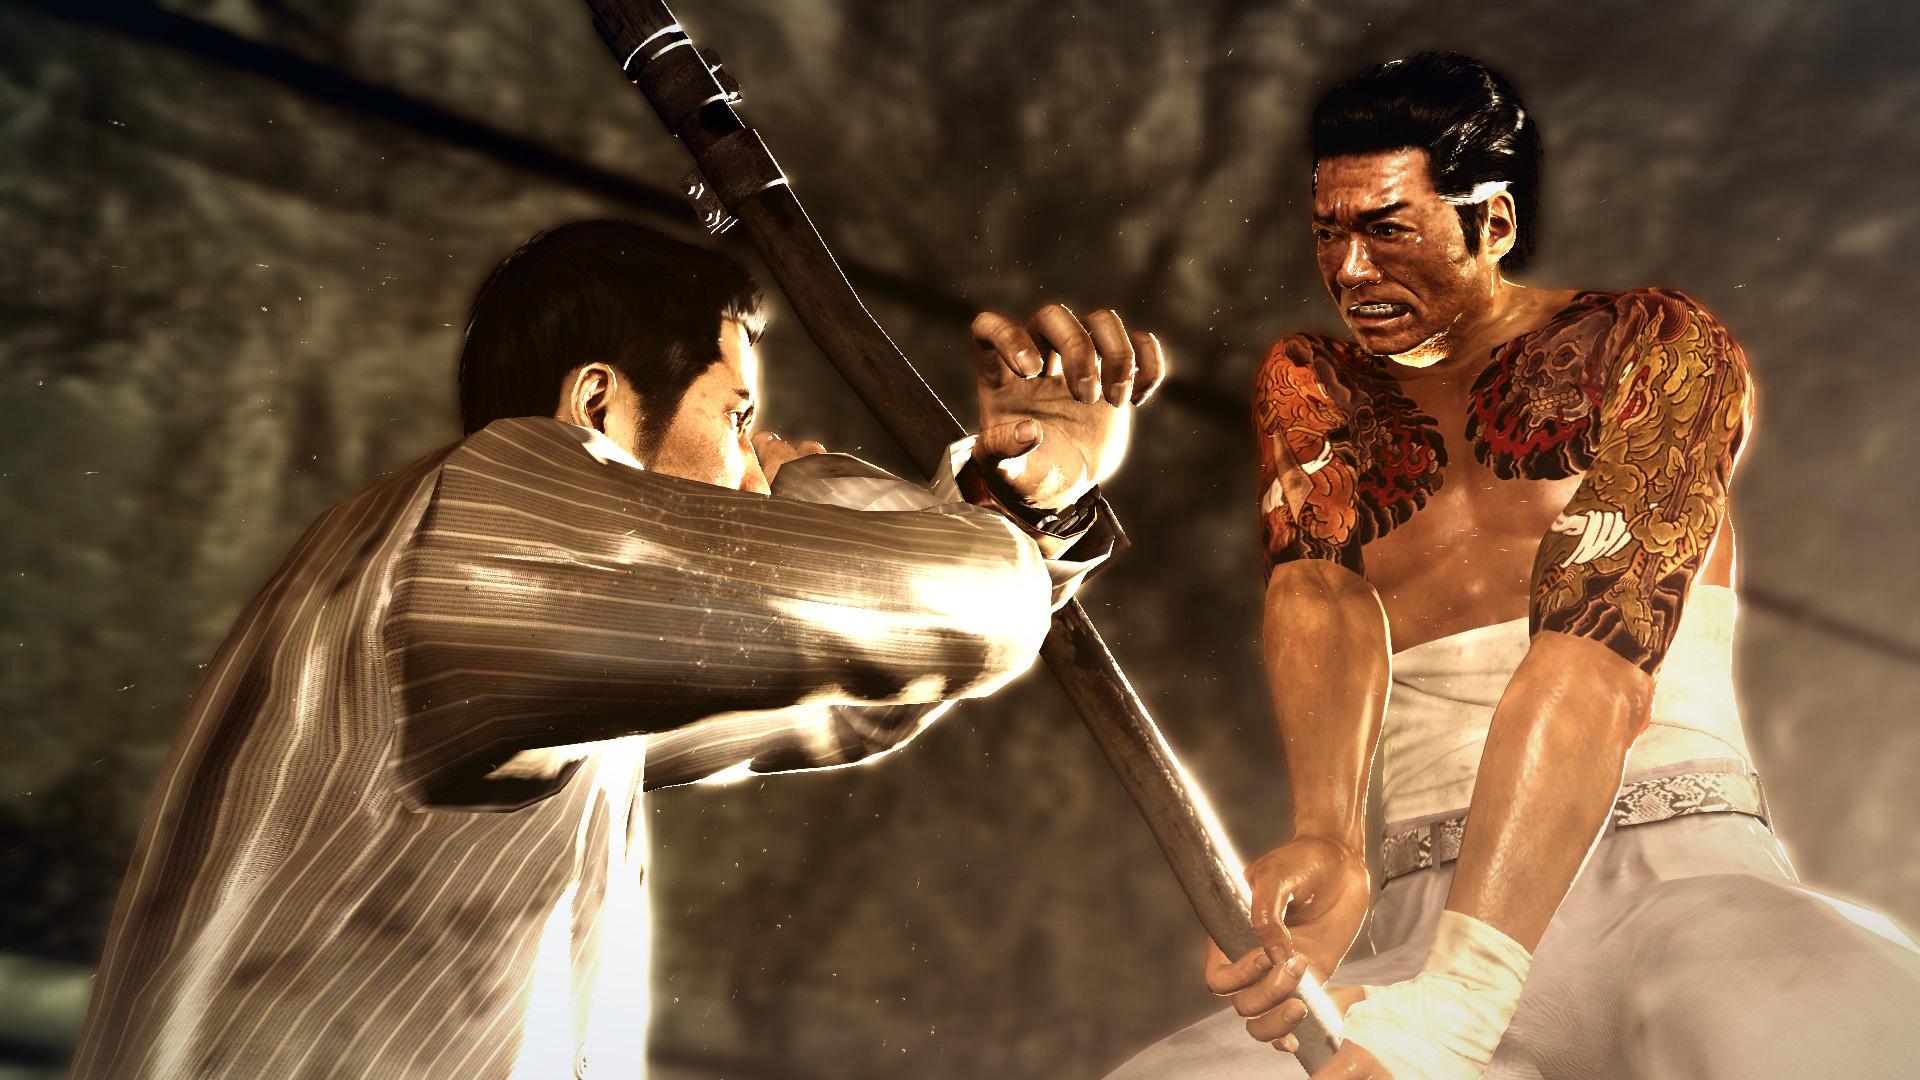 Yakuza 0 is five bucks in Sega's 'Best of Japan' Steam sale screenshot